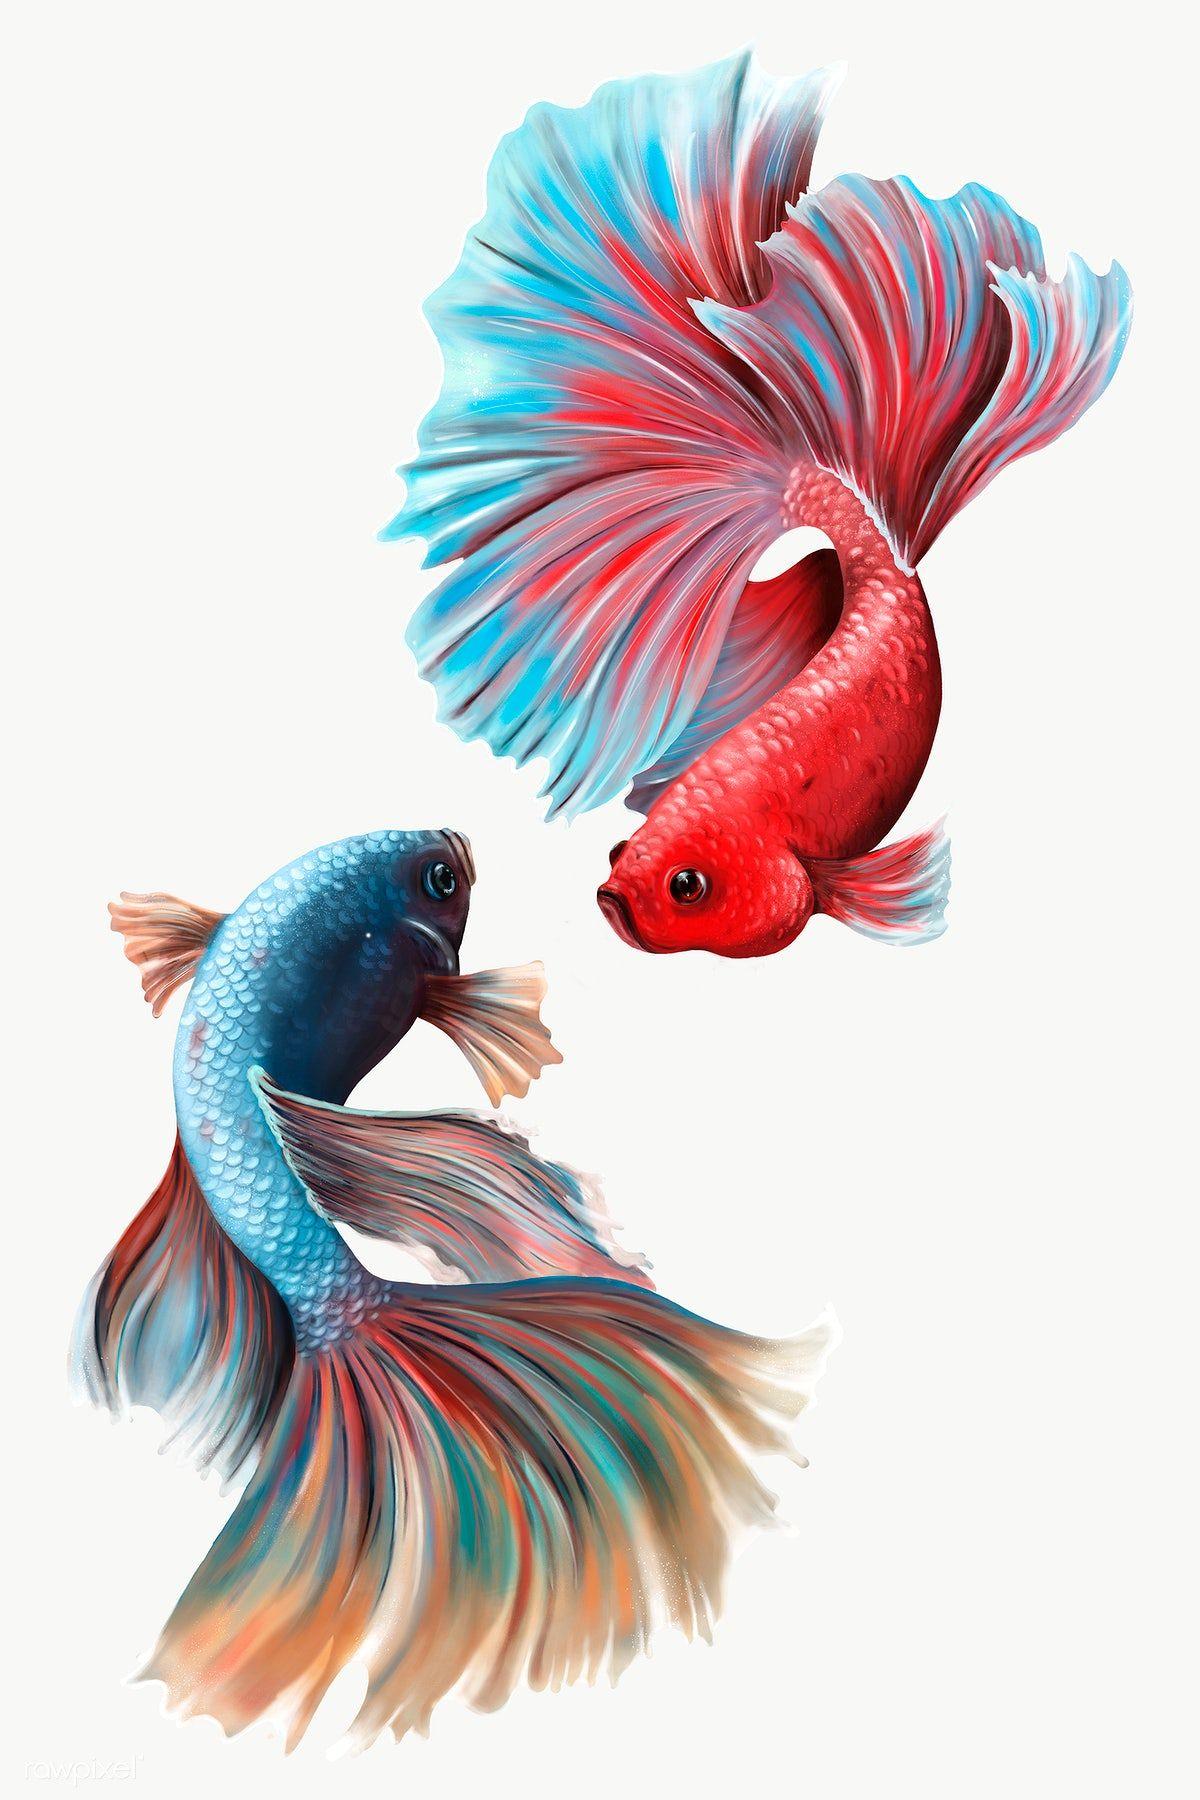 Colorful Betta Fishes Design Element Premium Image By Rawpixel Com Te Betta Hewan Ikan Cupang